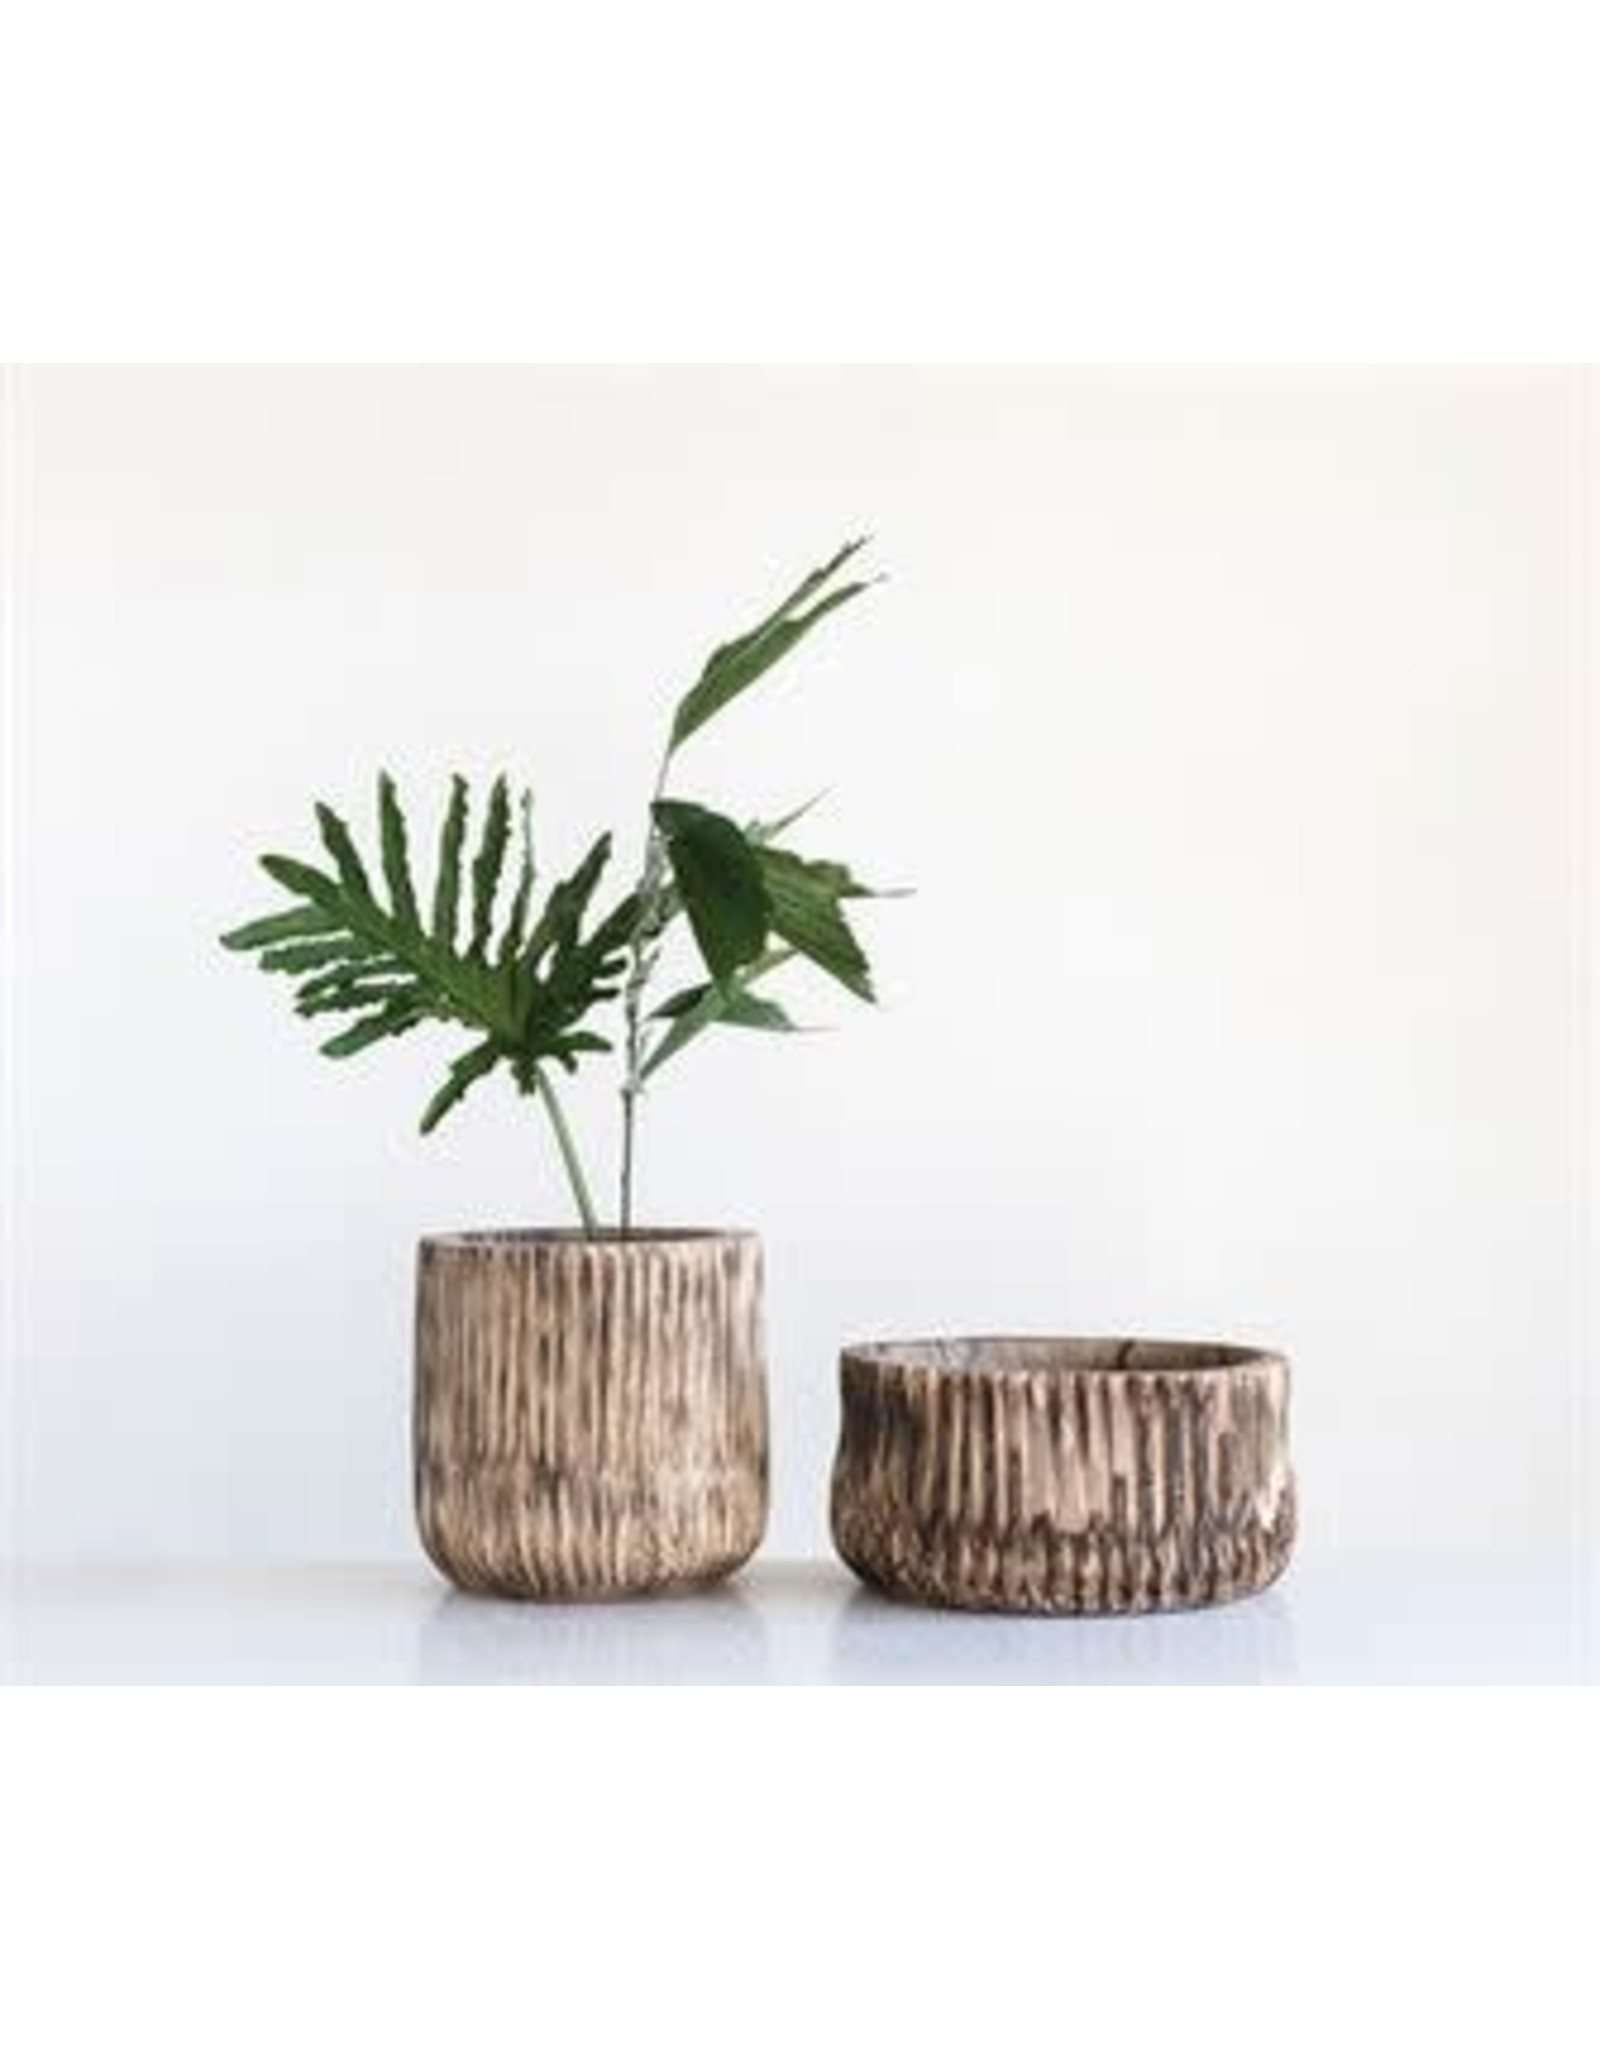 Carved Paulownia Wood Pot